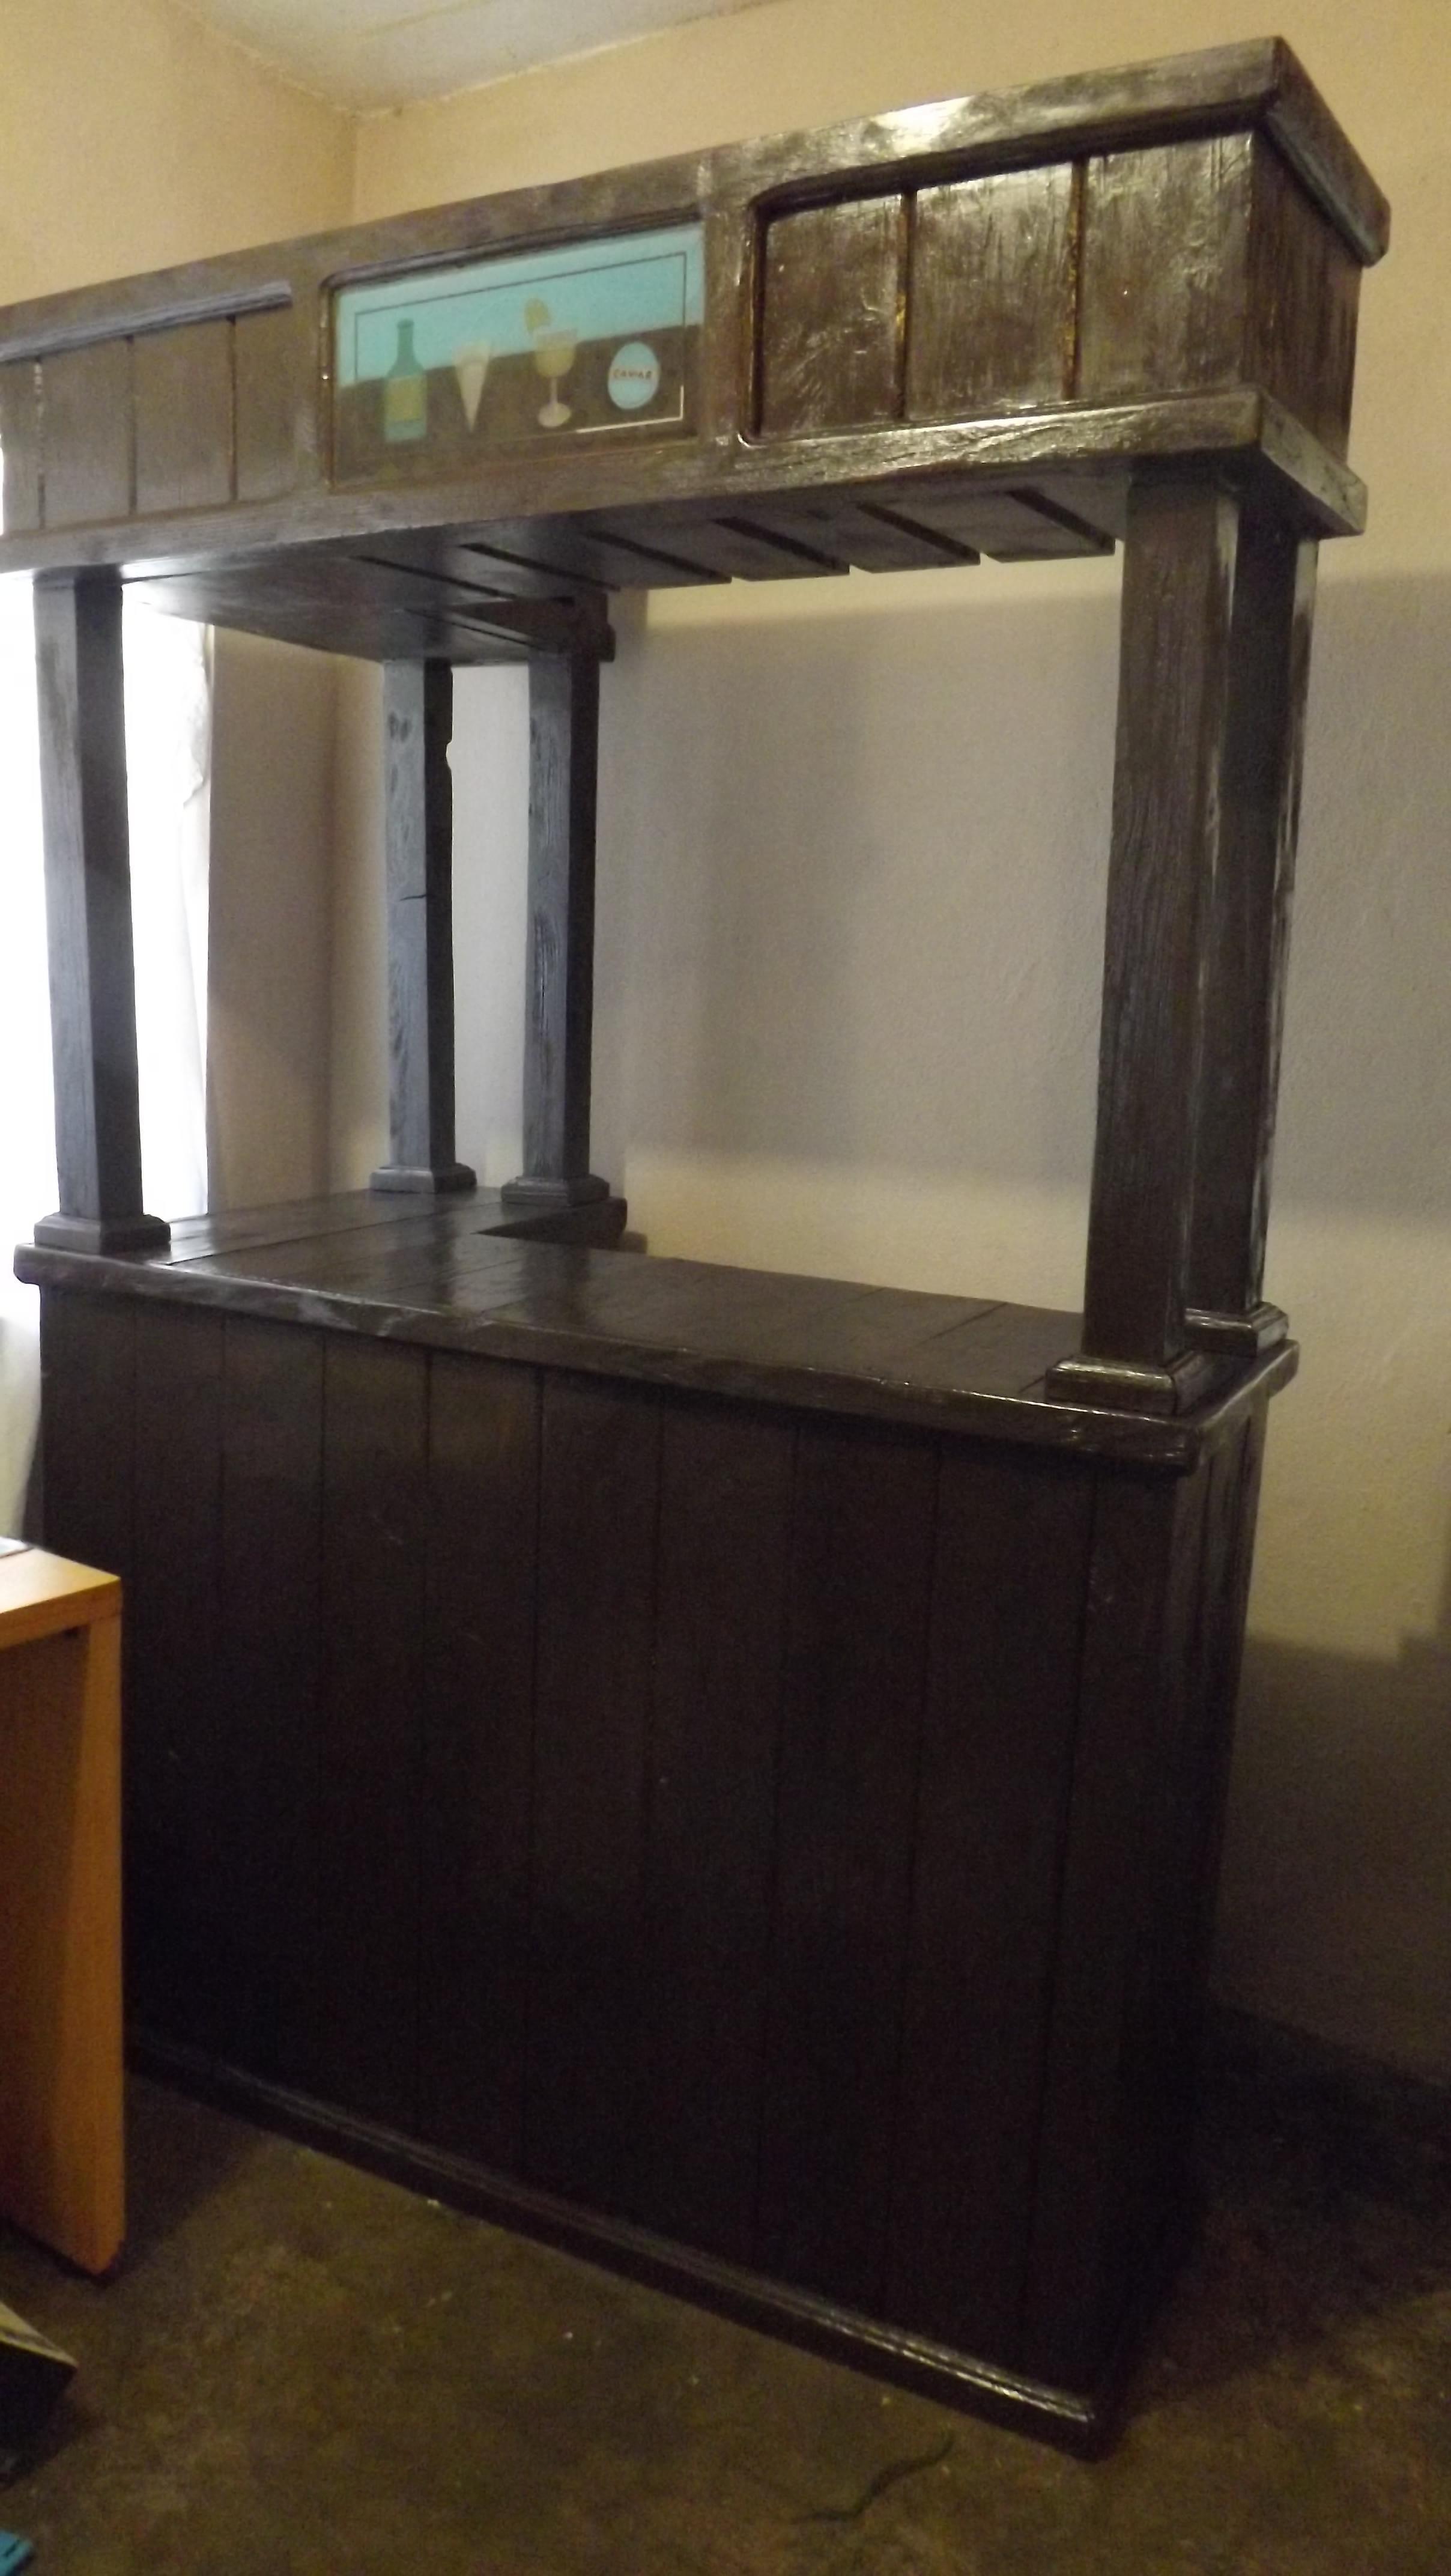 Cantina 100 madera for Diseno de cantinas para el hogar